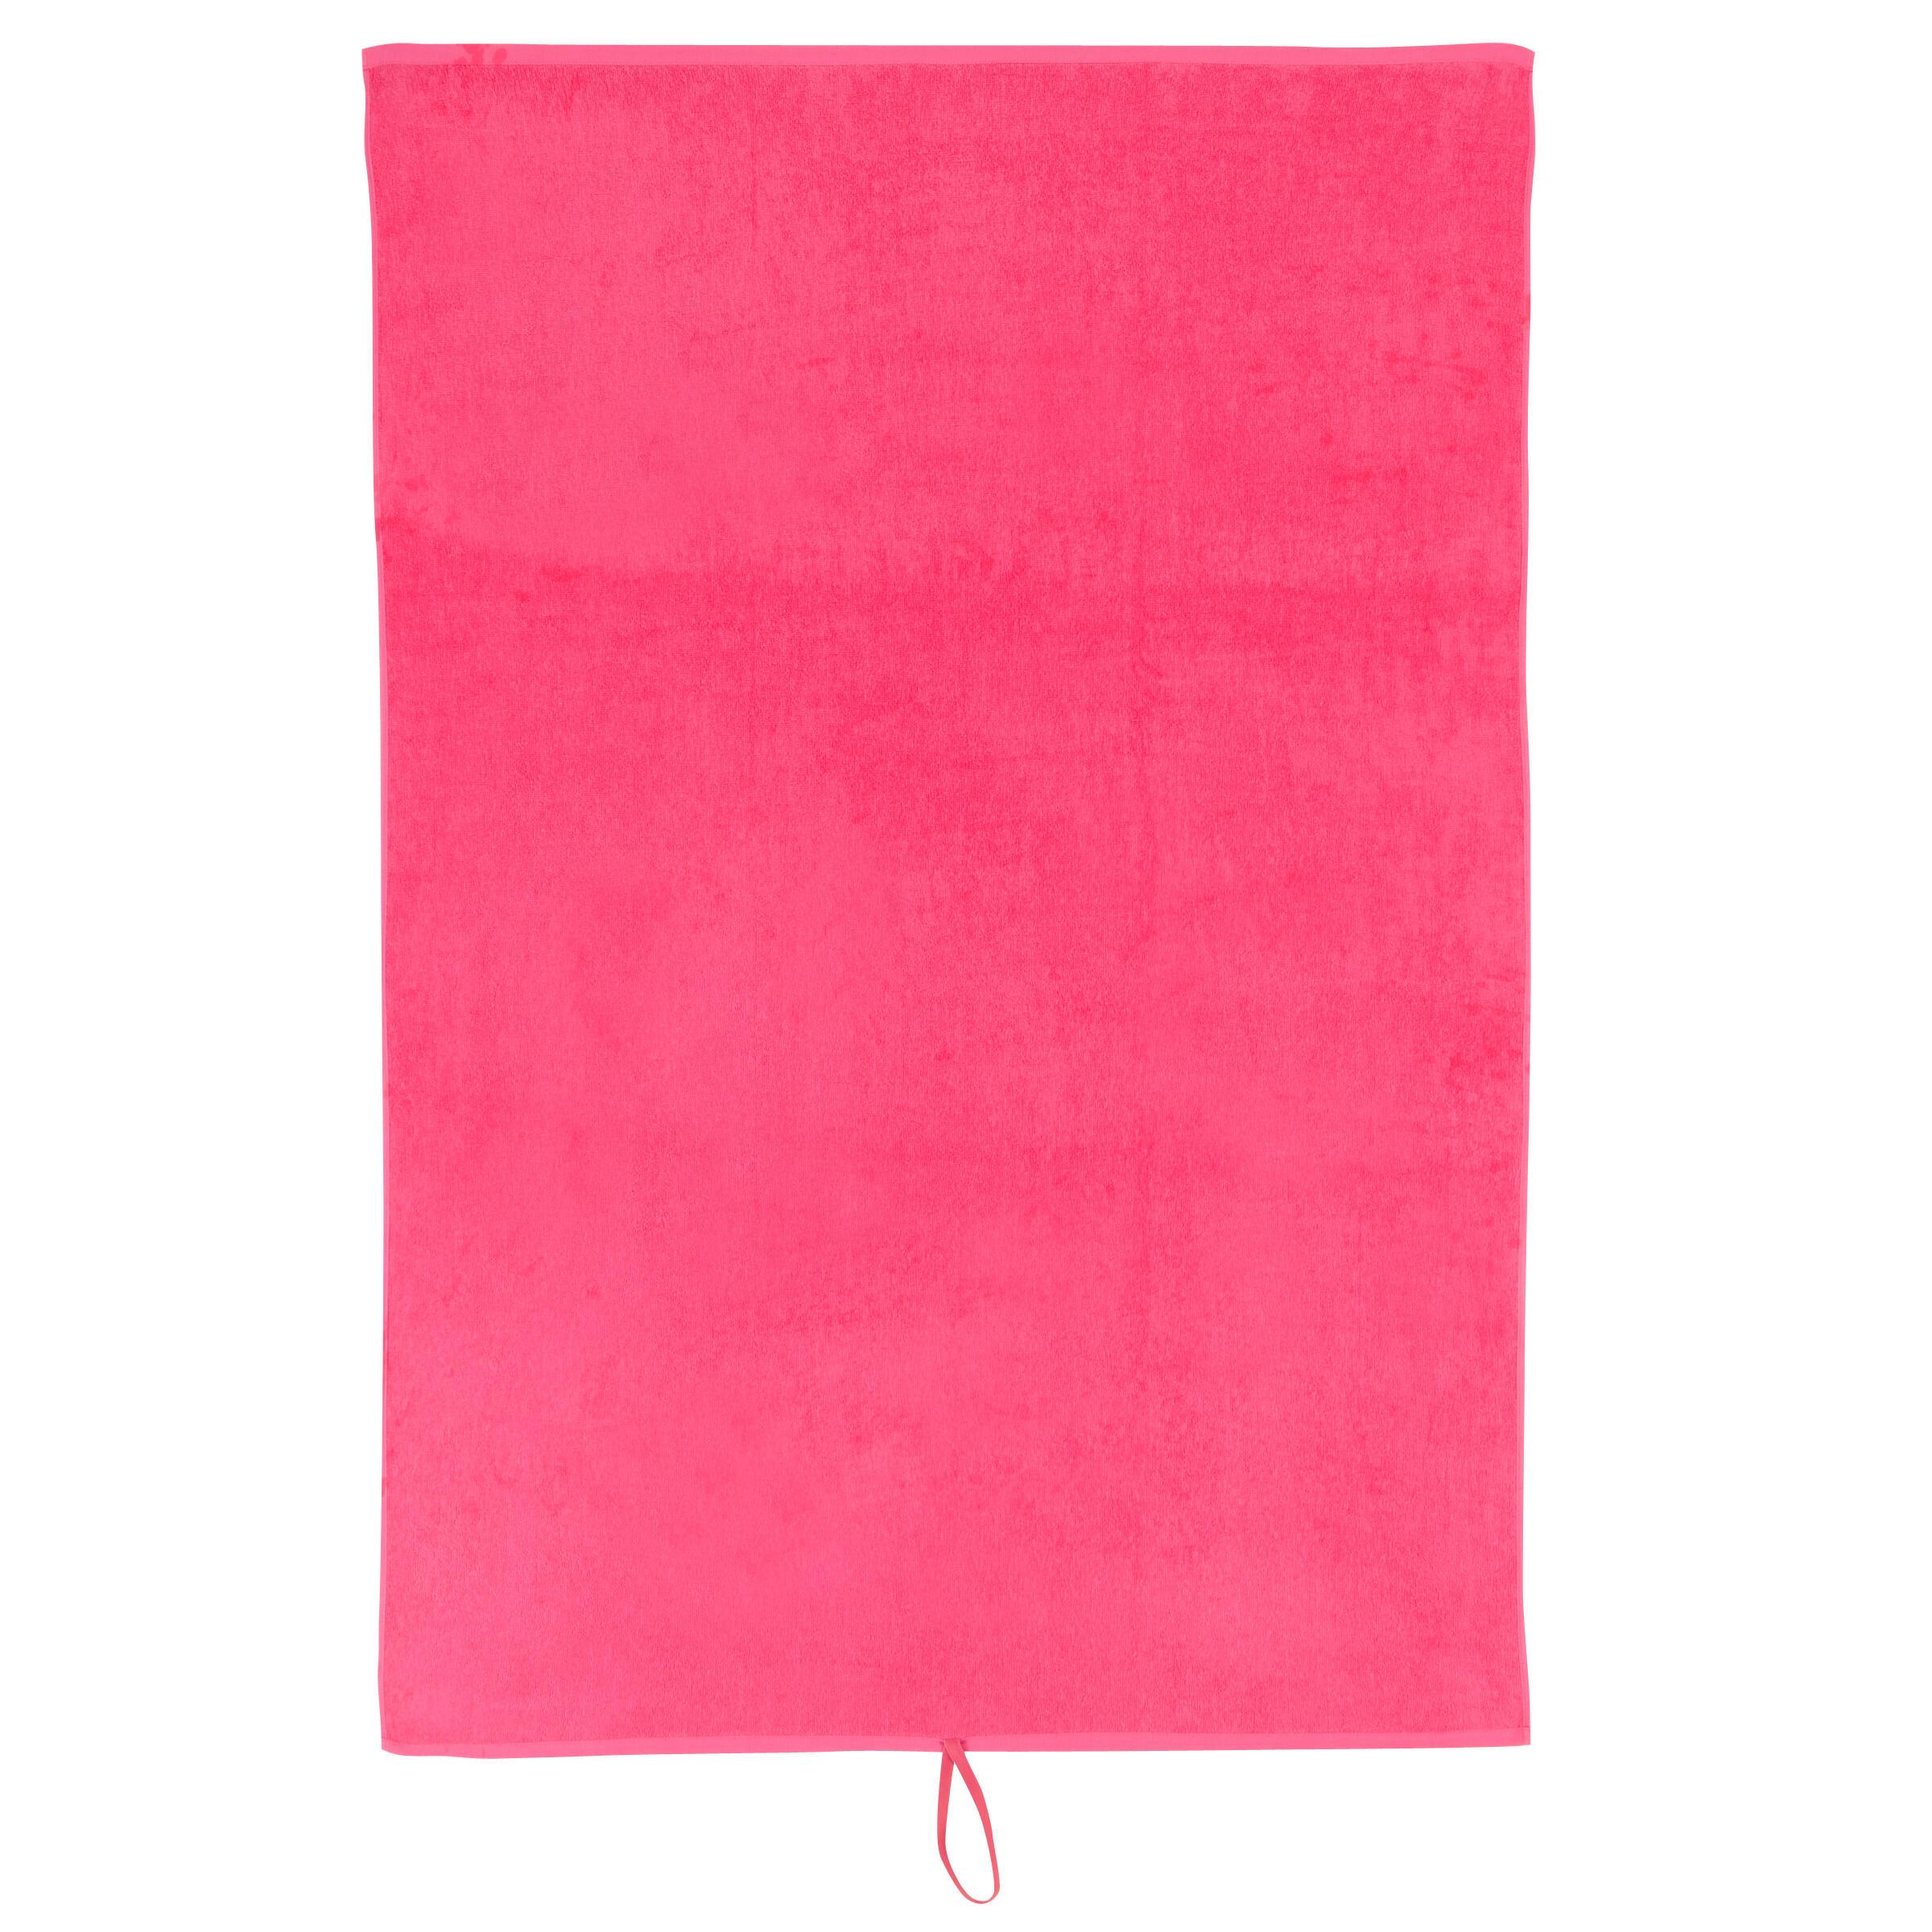 Toalla grande fitness algodón rosa Domyos